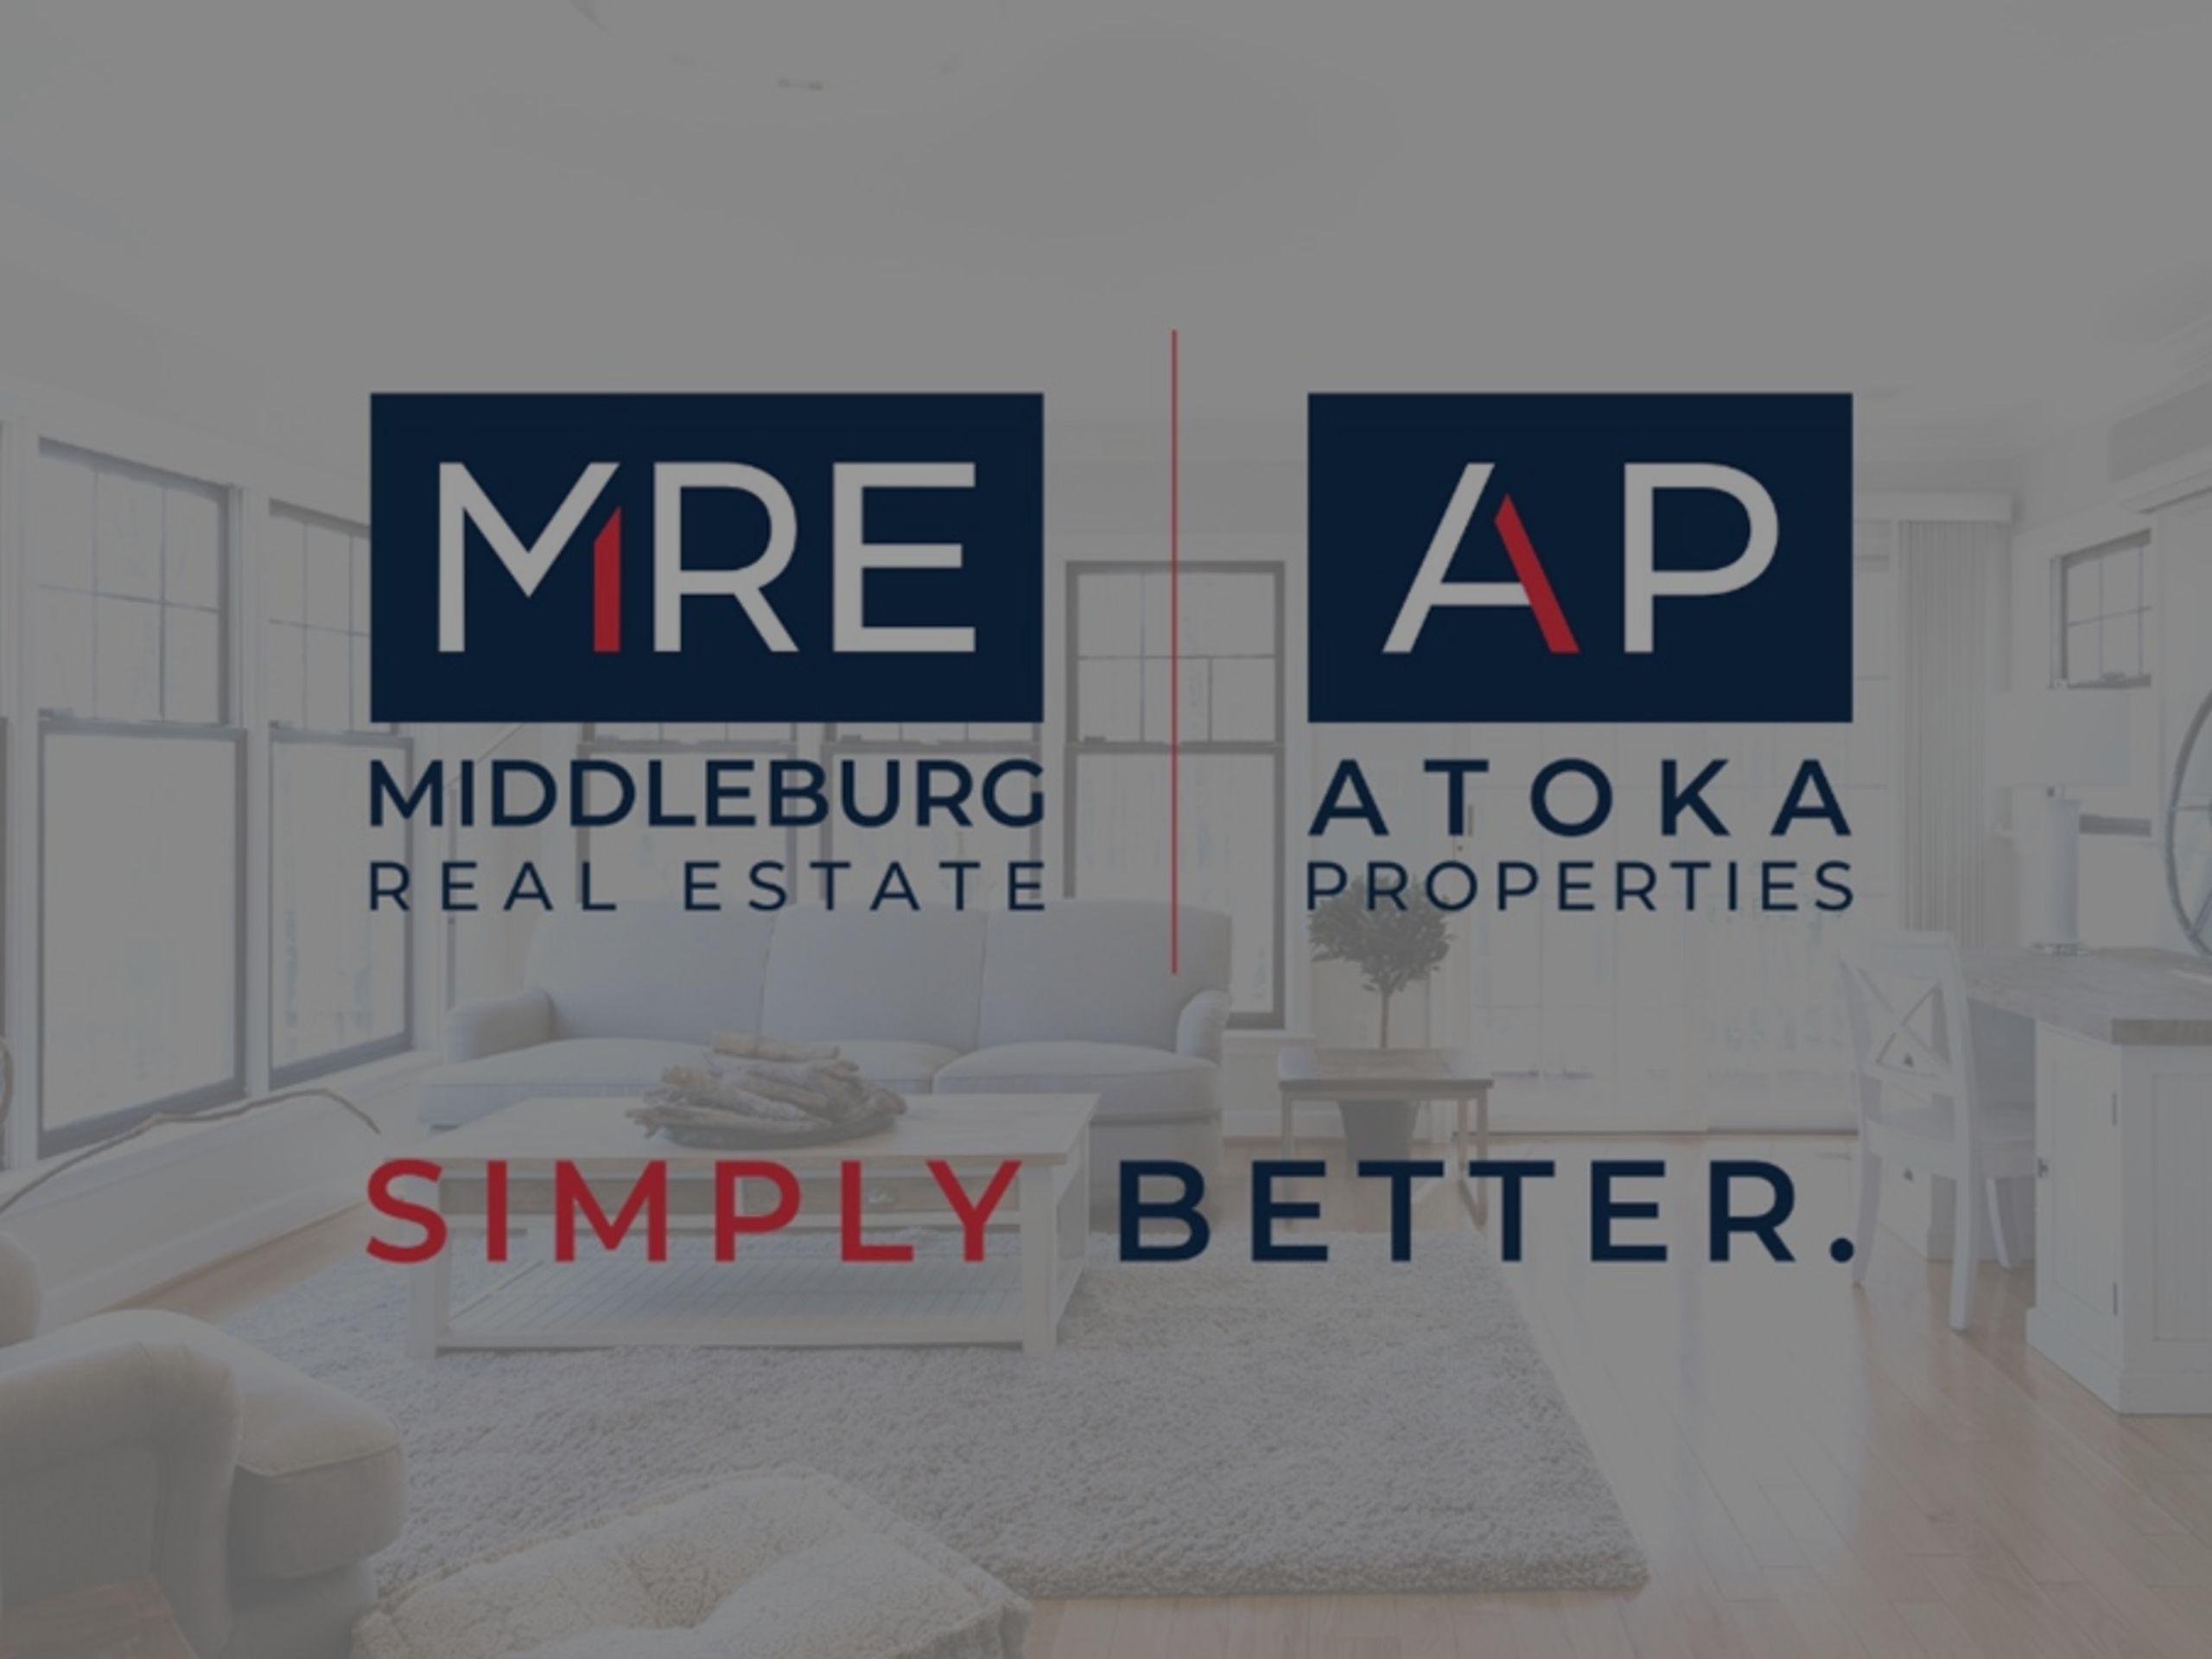 MRE | AP REBRAND, RACES, & MORE